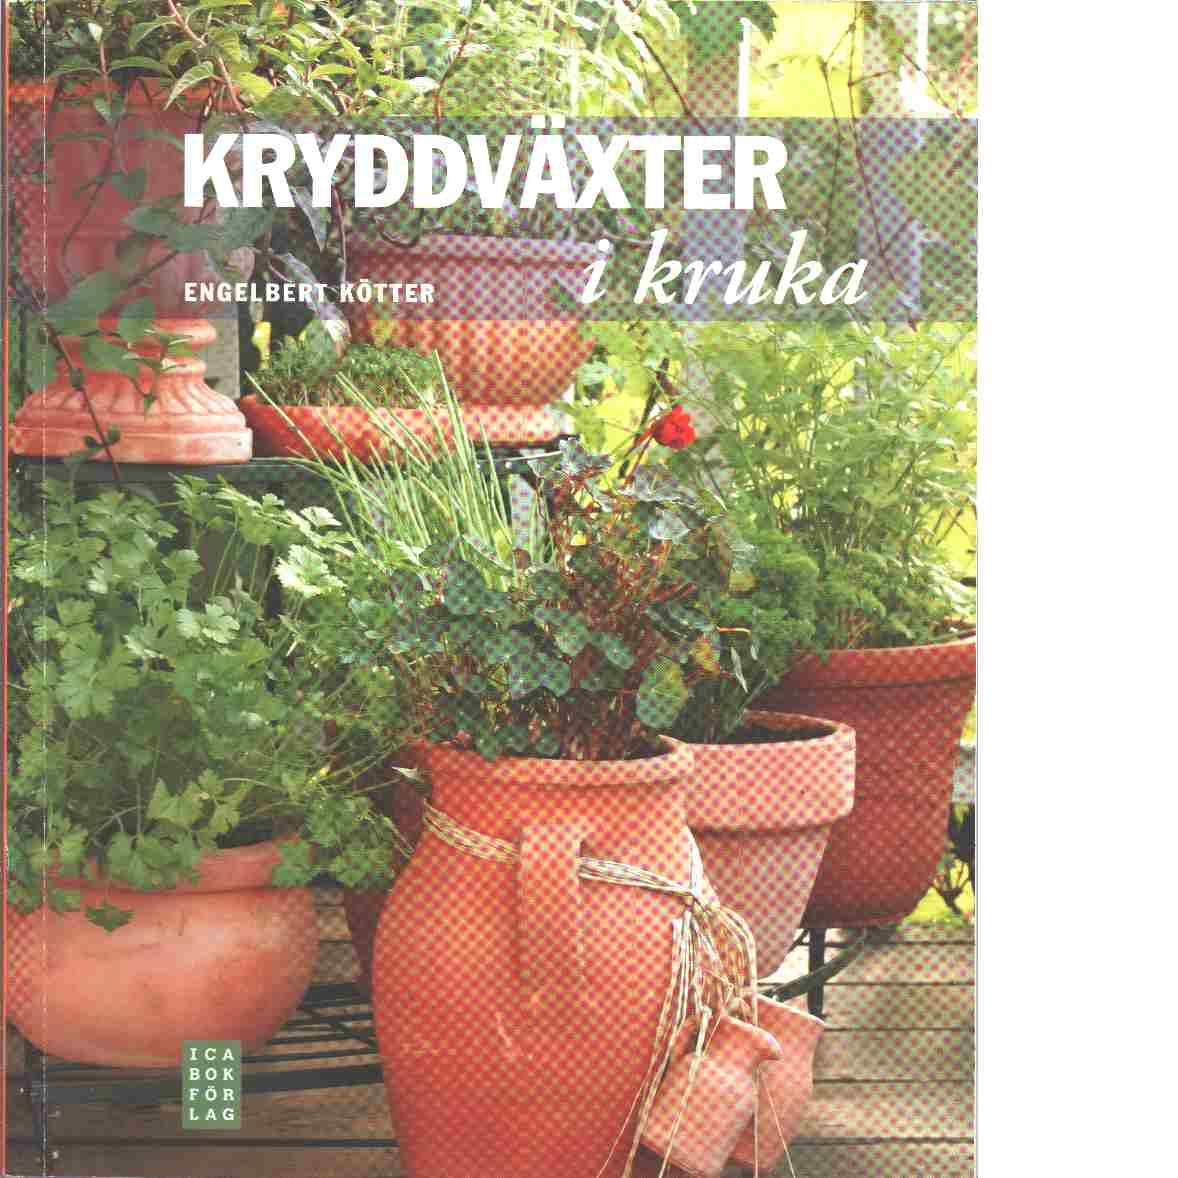 Kryddväxter i kruka - Kötter, Engelbert